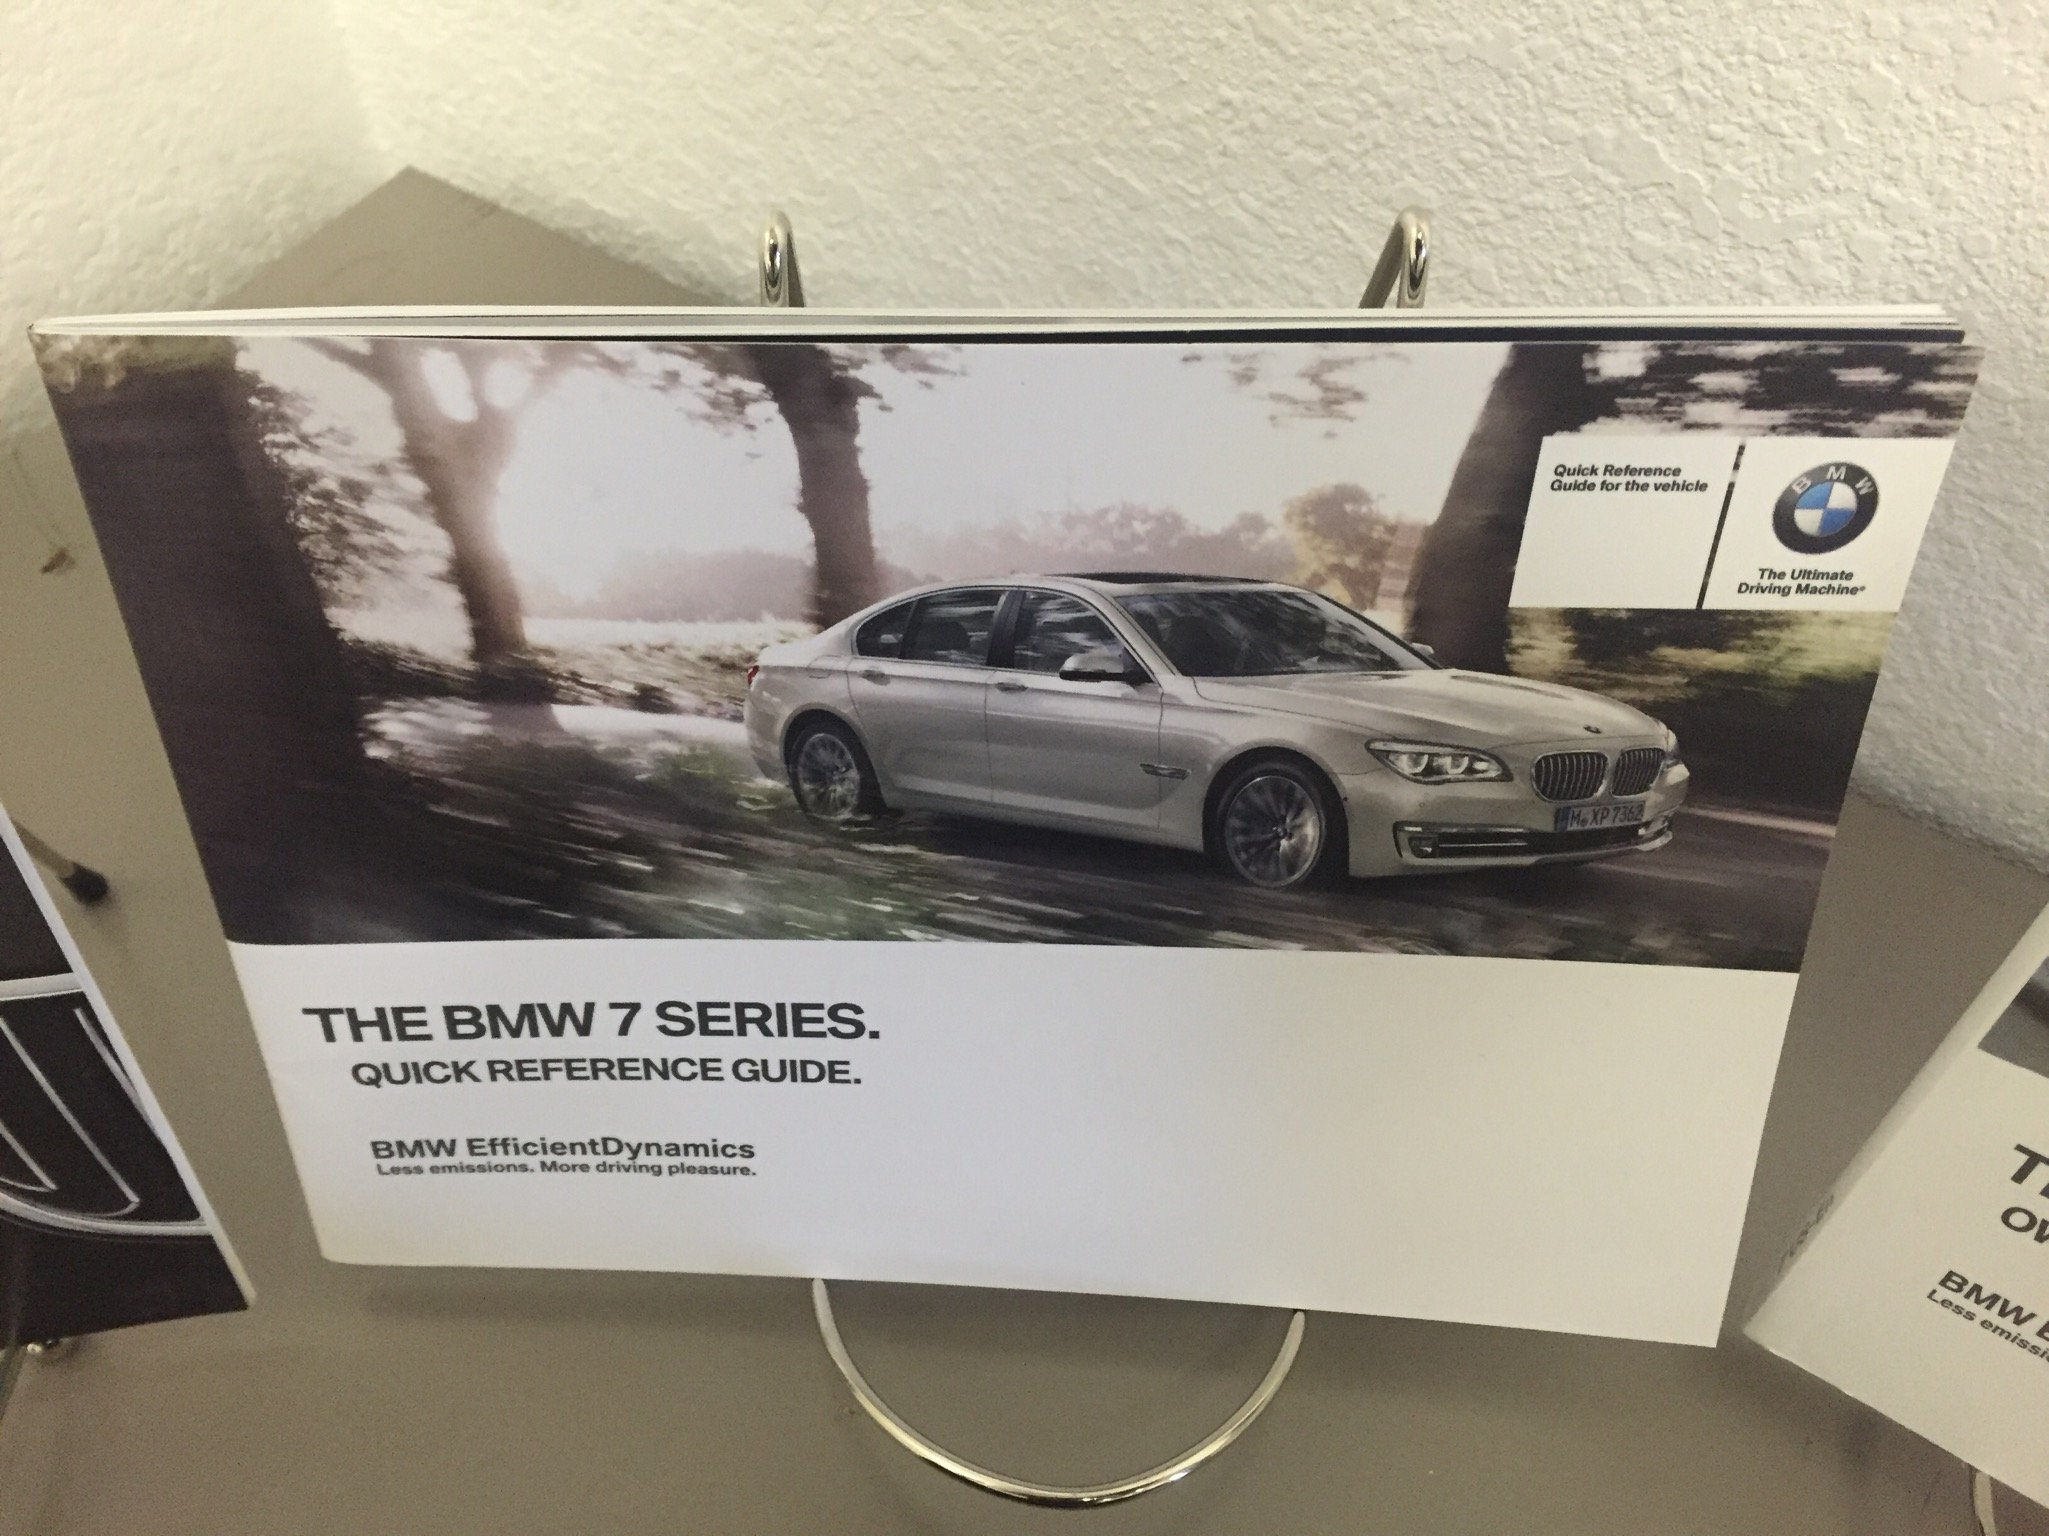 2014 BMW 7 SERIES SEDAN GENUINE OEM OWNER'S MANUAL FOR 740i 740Li 750i 760i  and xDrive MODELS: BMW: 0682821520631: Amazon.com: Books